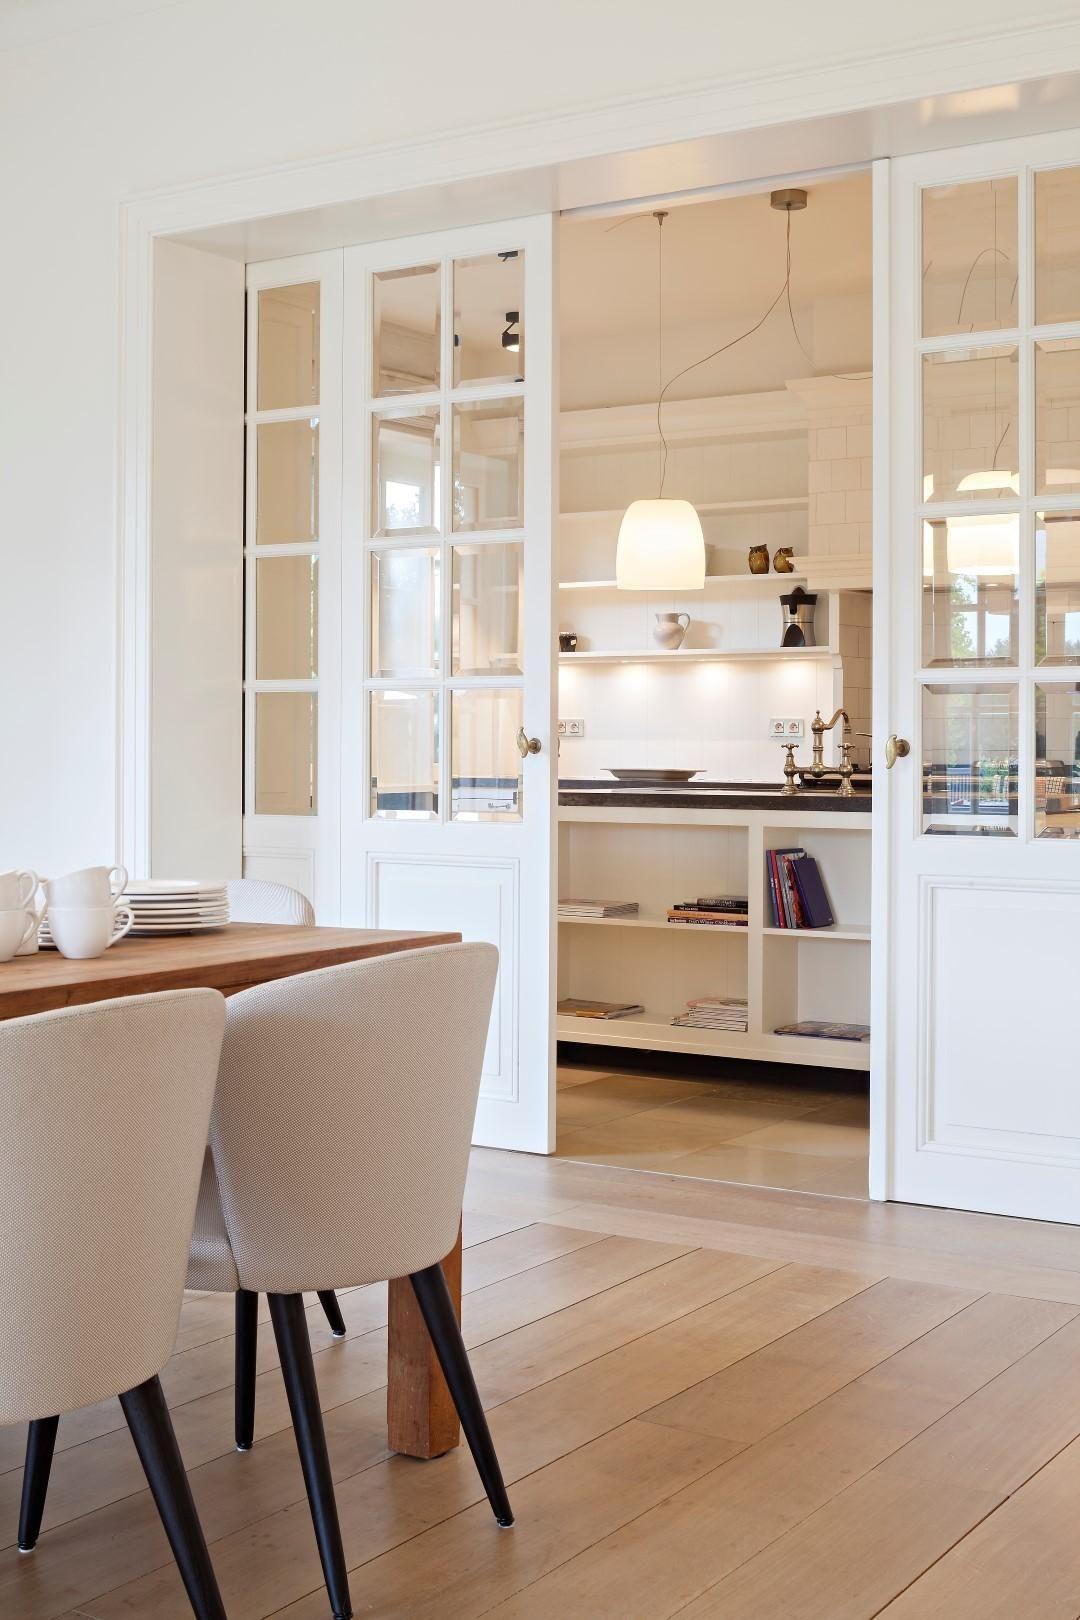 Eetkamer door Paul Vaes Interior Design | C&C idea\'s | Pinterest ...